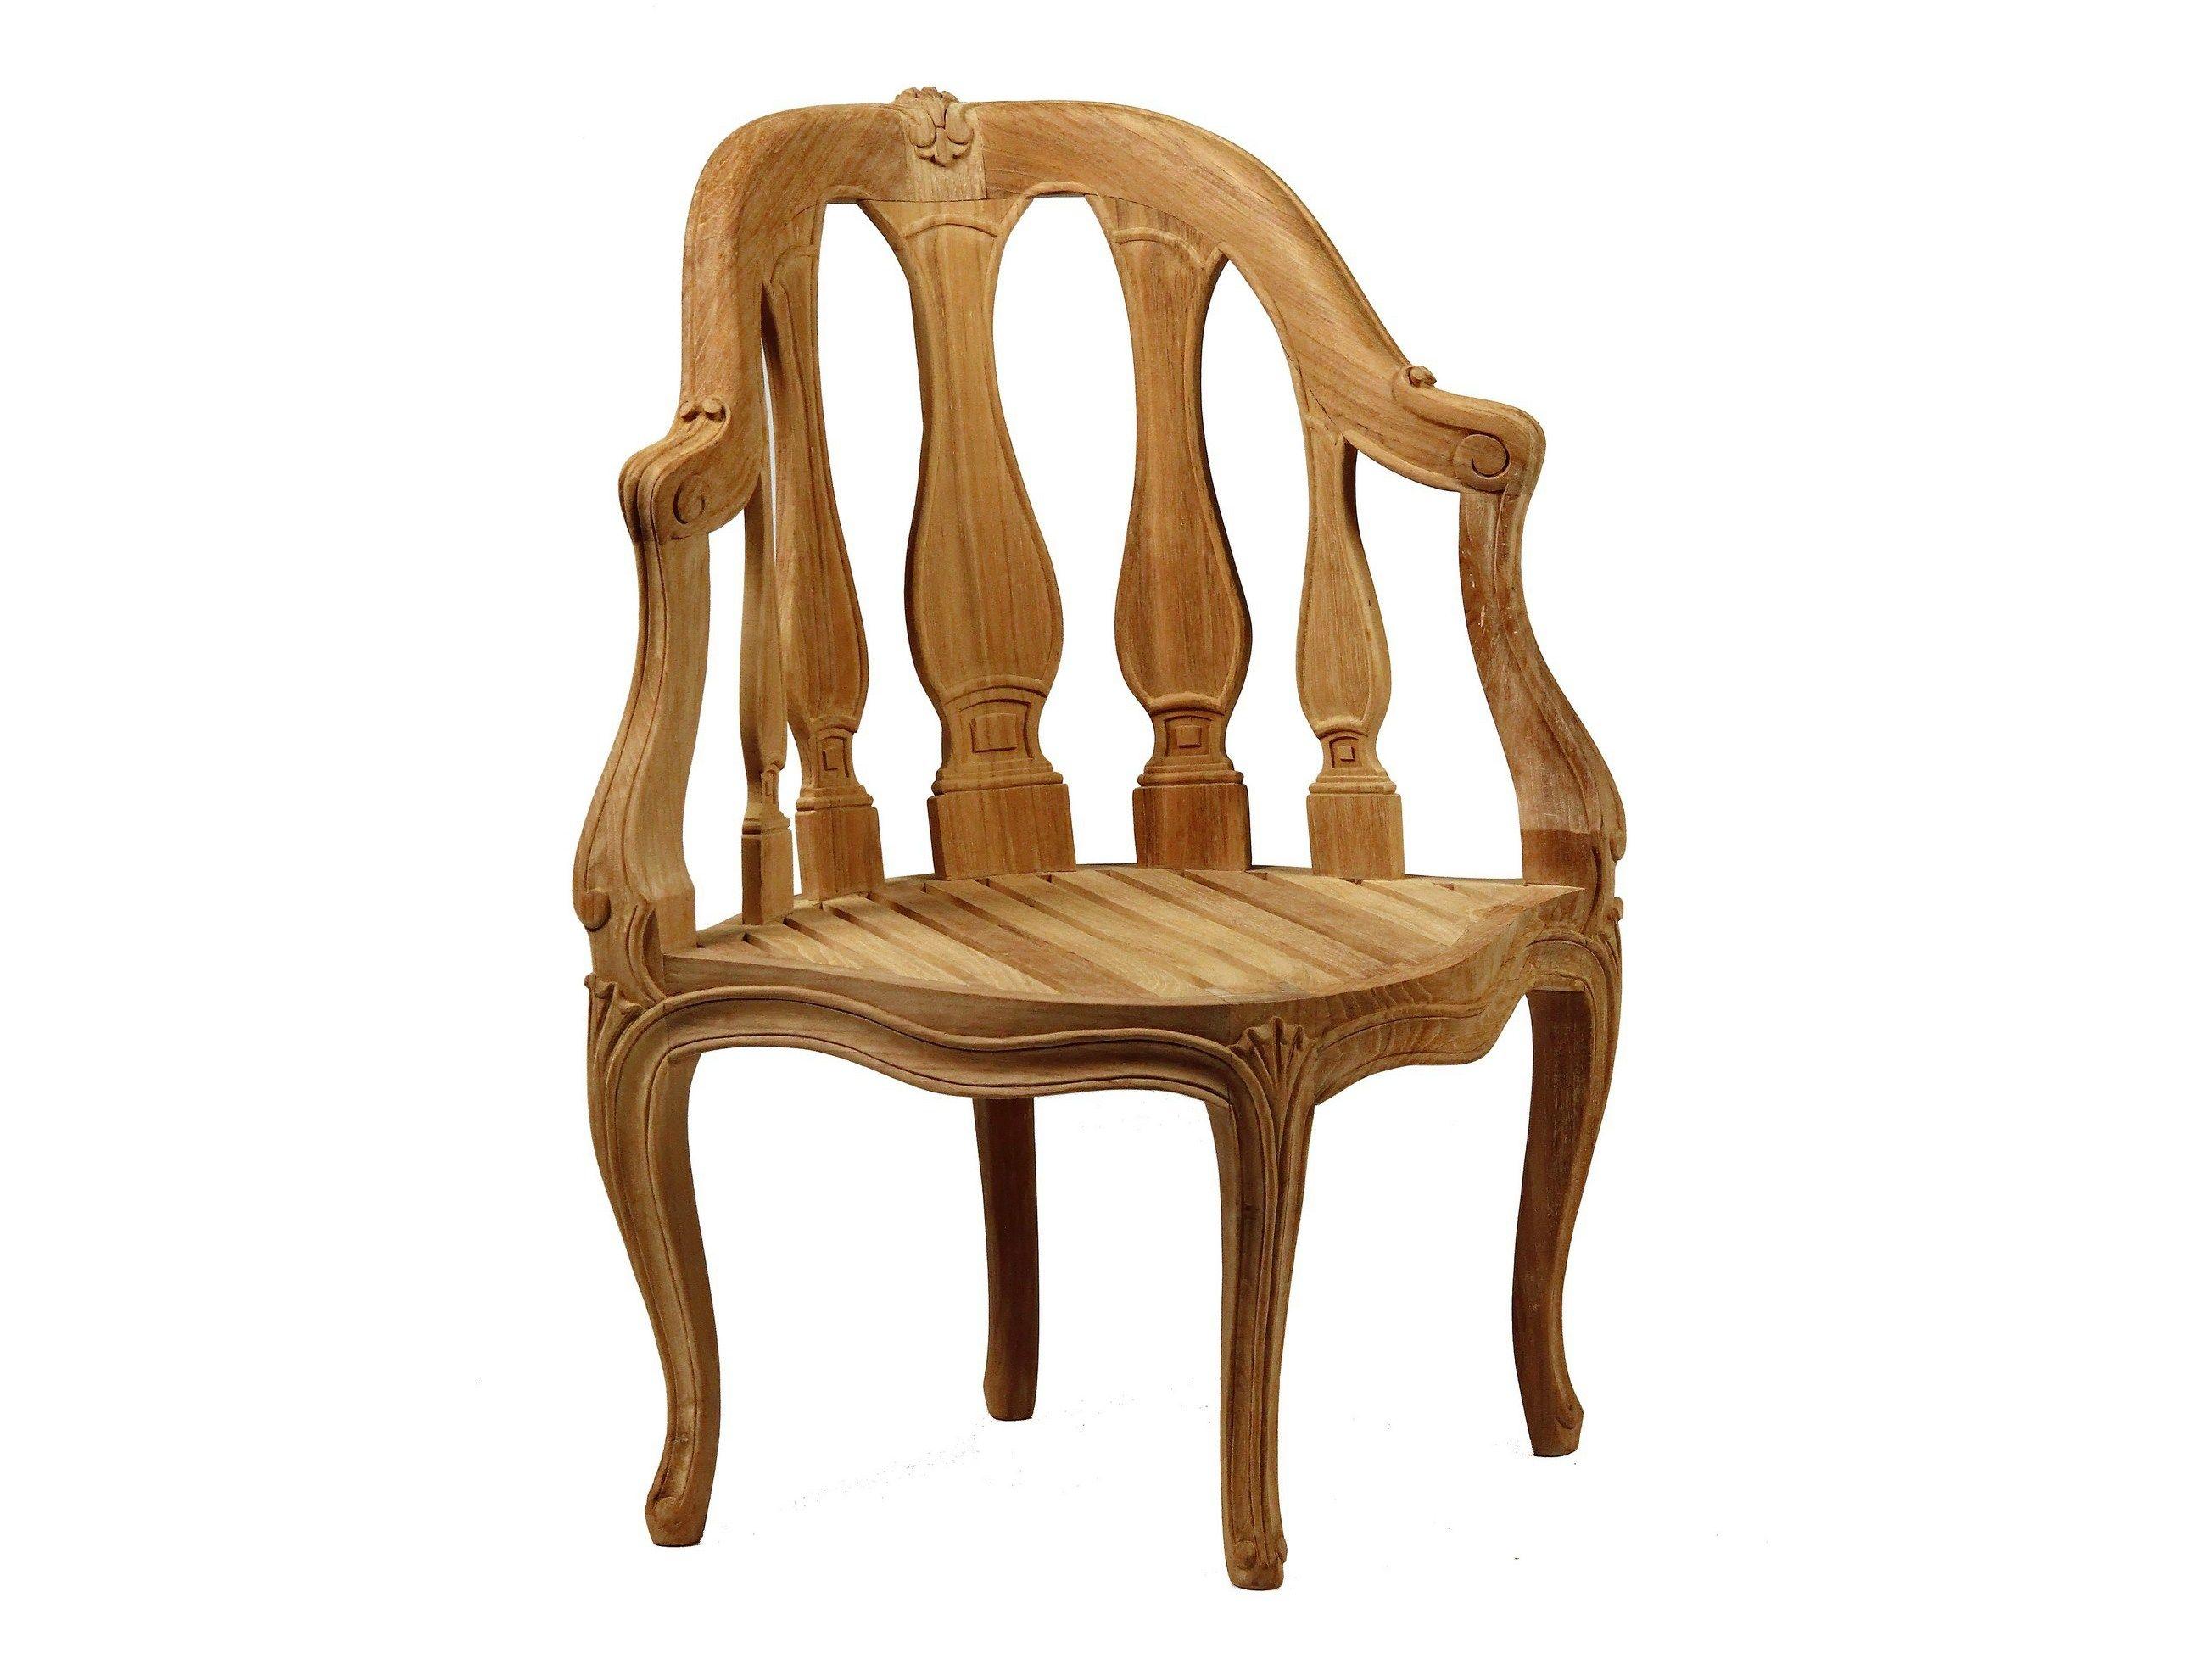 petit fauteuil de jardin en teck collection lupin by astello. Black Bedroom Furniture Sets. Home Design Ideas